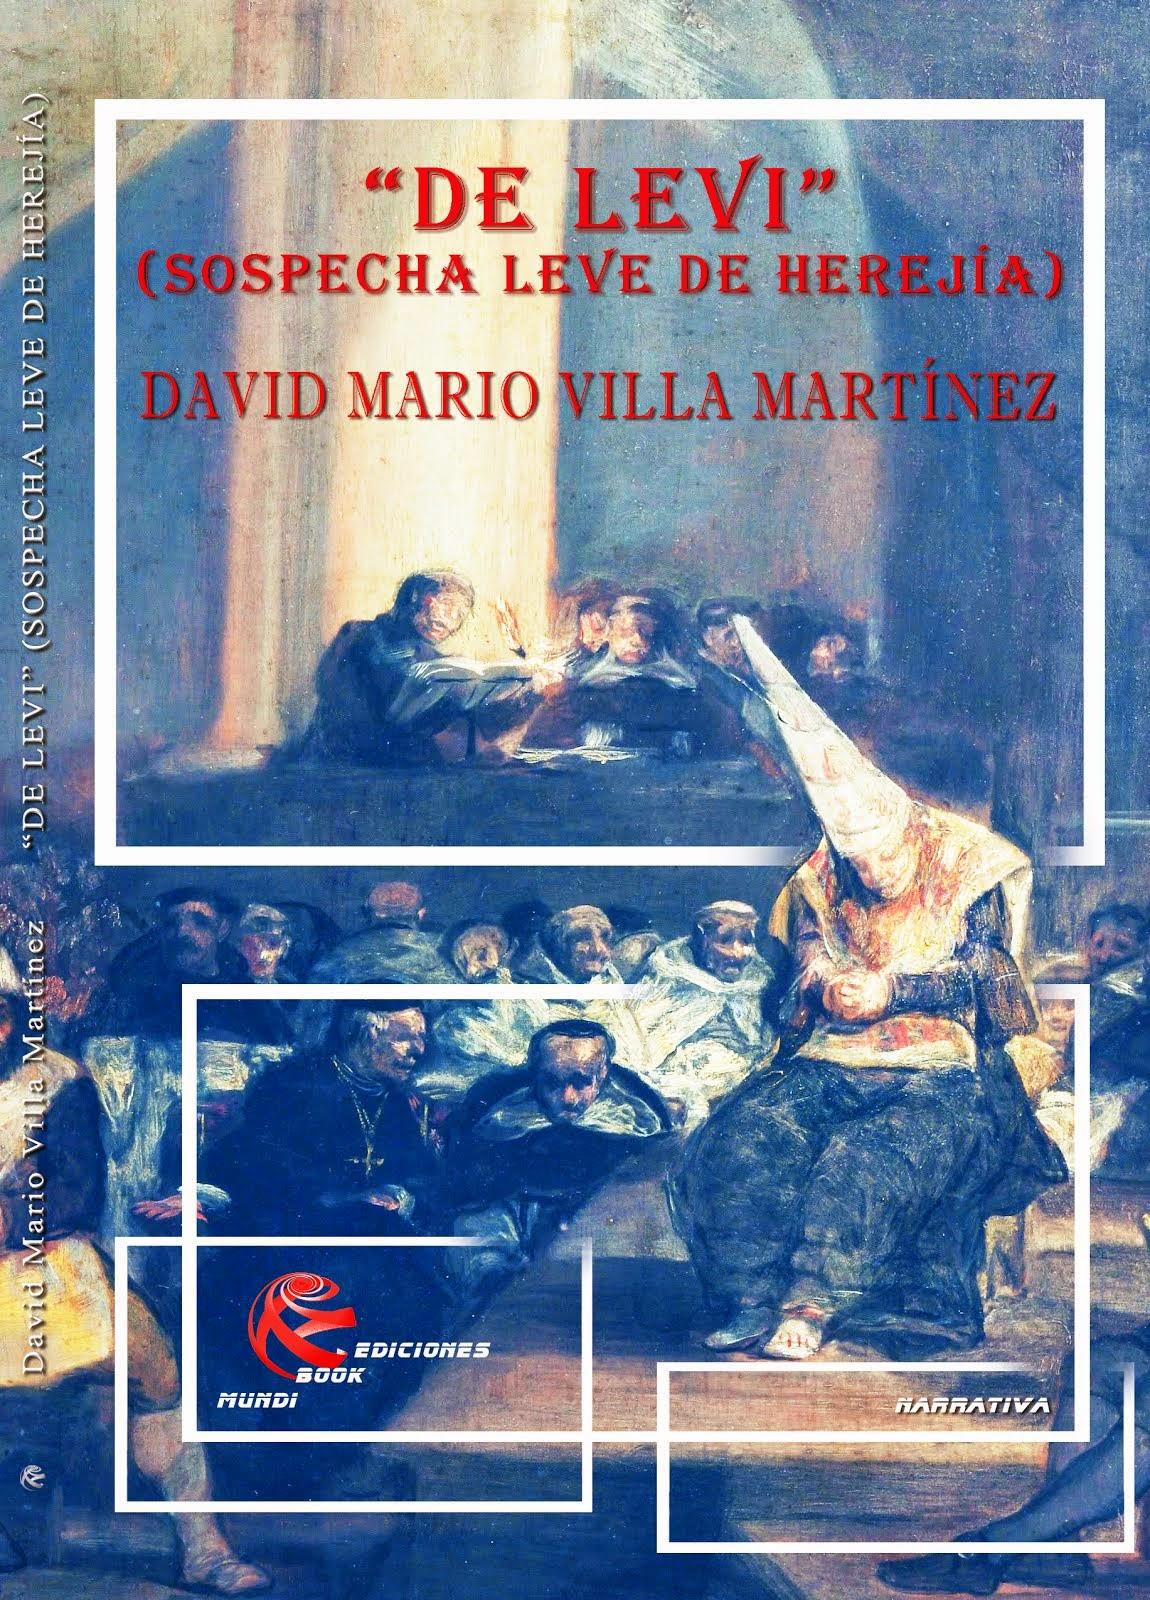 """DE LEVI"" (SOSPECHA LEVE DE HEREJÍA)"